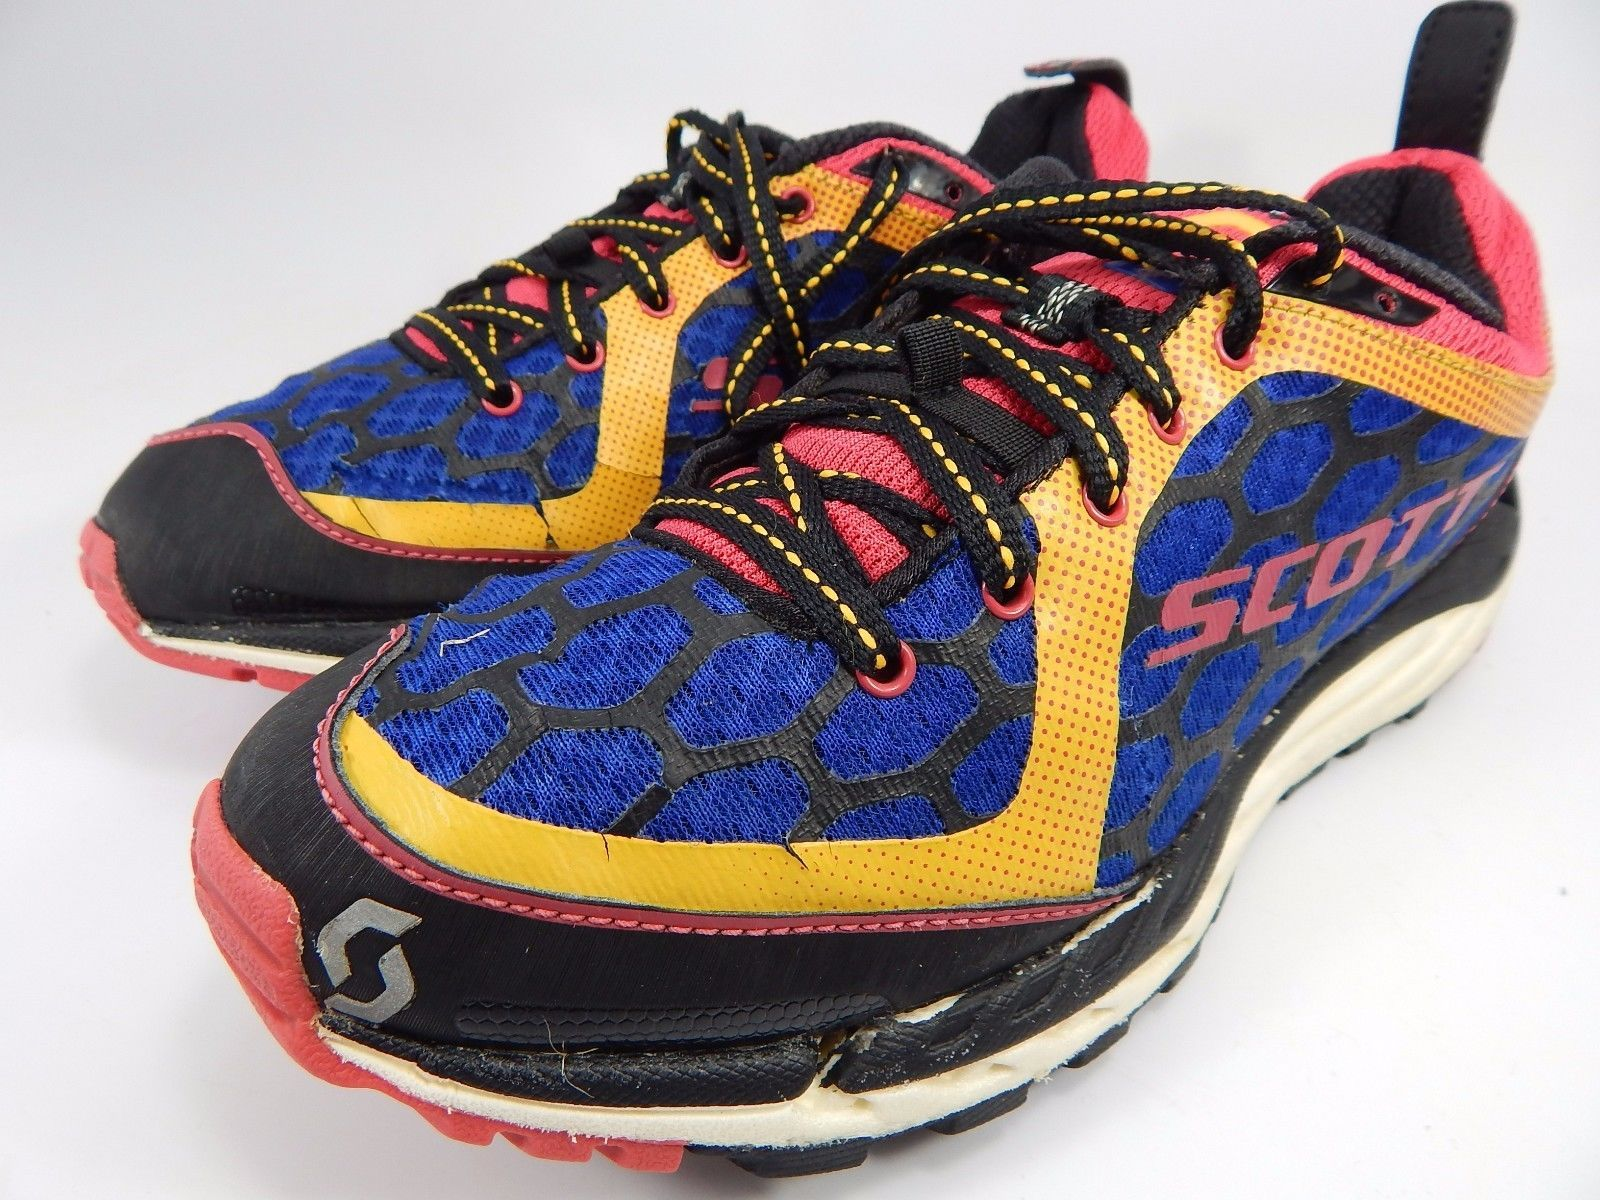 Scott 2014 Women's T2 Kinabalu Trail Running Shoes Size US 7.5 M (B) EU 38.5